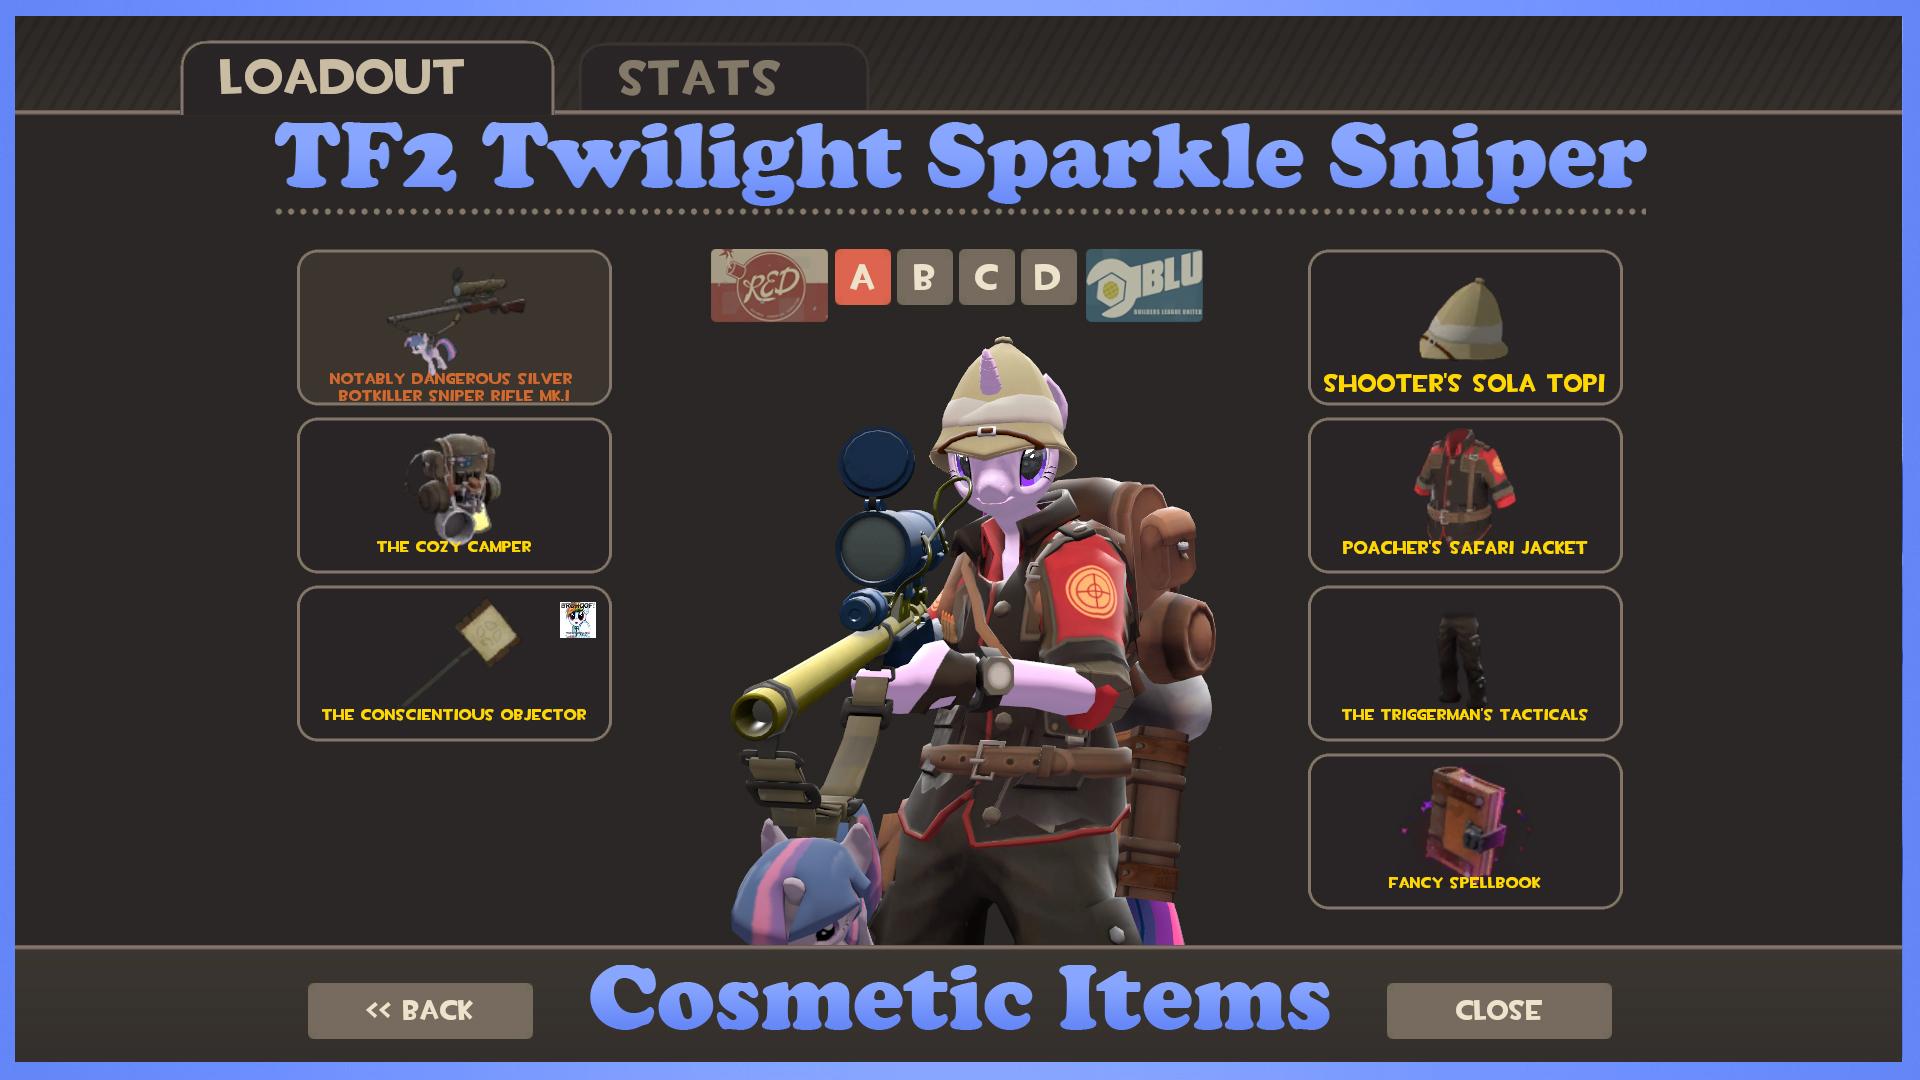 Tf2 2020 Christmas Cosmetics TF2 Twilight Sparkle Sniper Cosmetic Items by LightningDart on